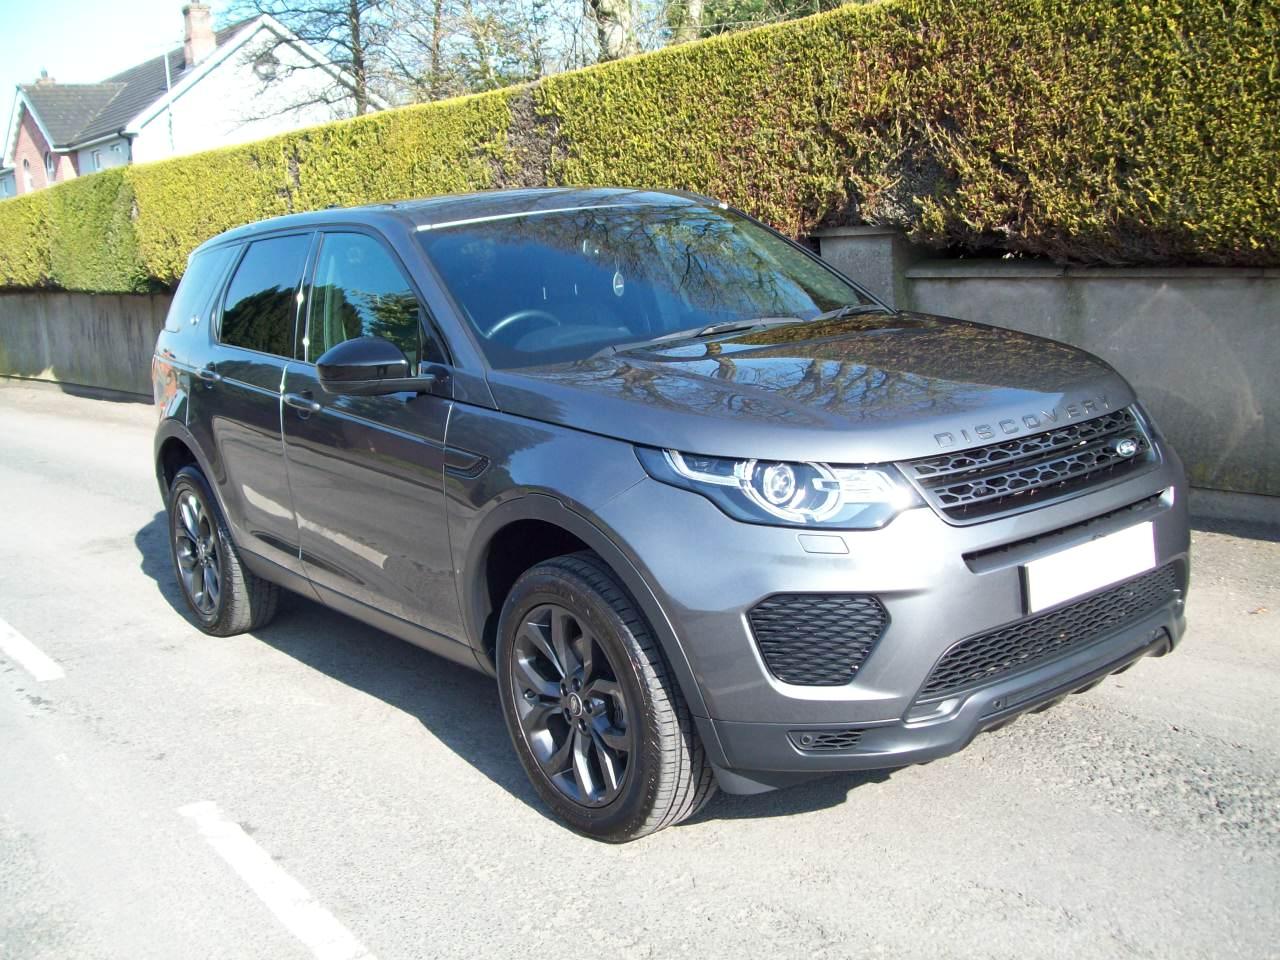 2019 Land Rover Discovery Sport Diesel Tiptronic Automatic – Derek Loane Motors